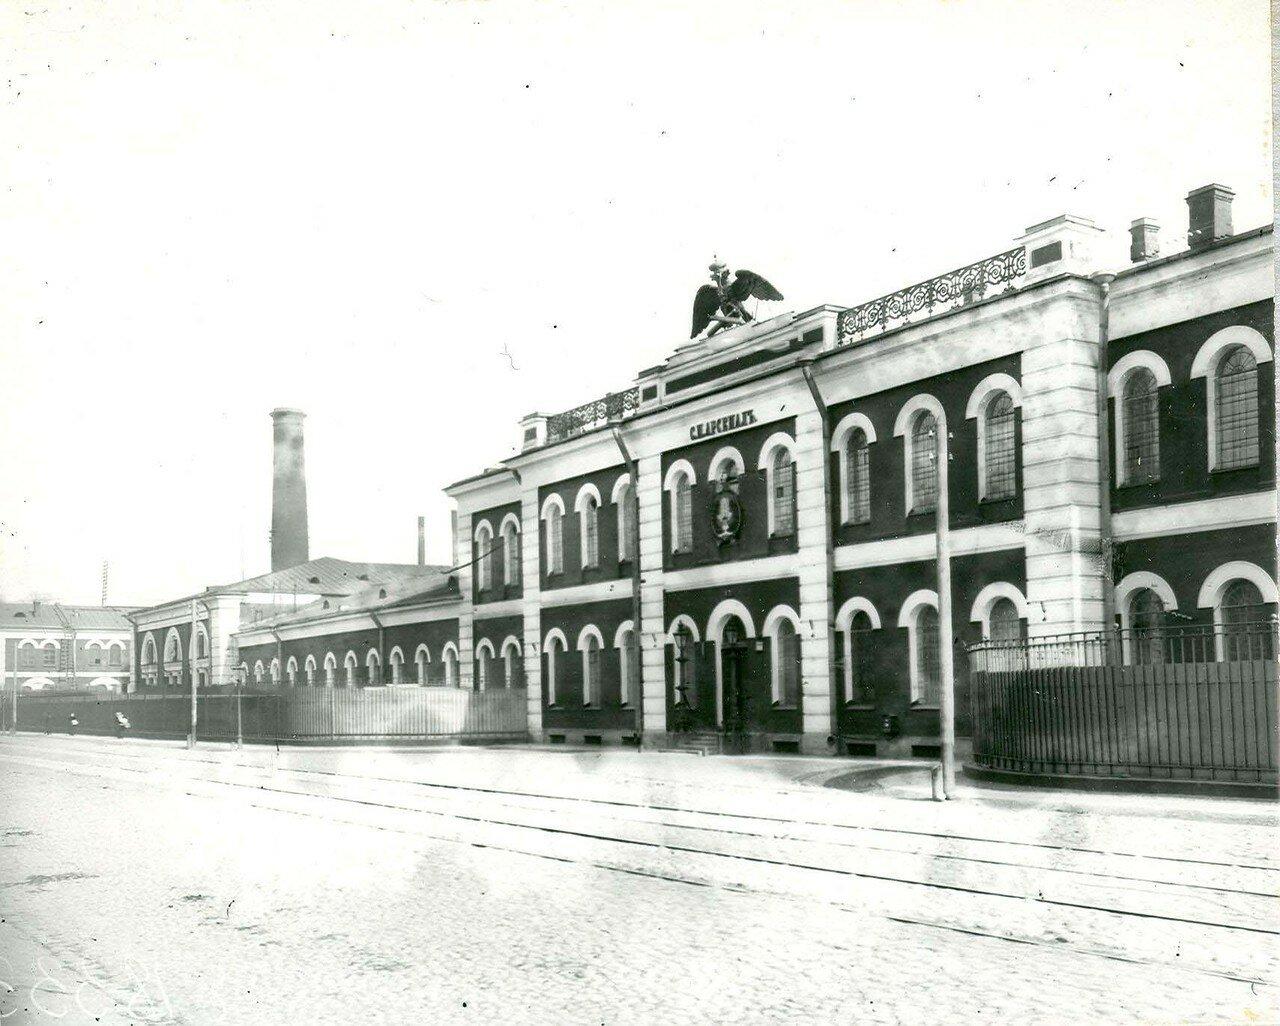 14.Внешний вид корпусов завода Арсенал Петра Великого. 21 апреля 1914